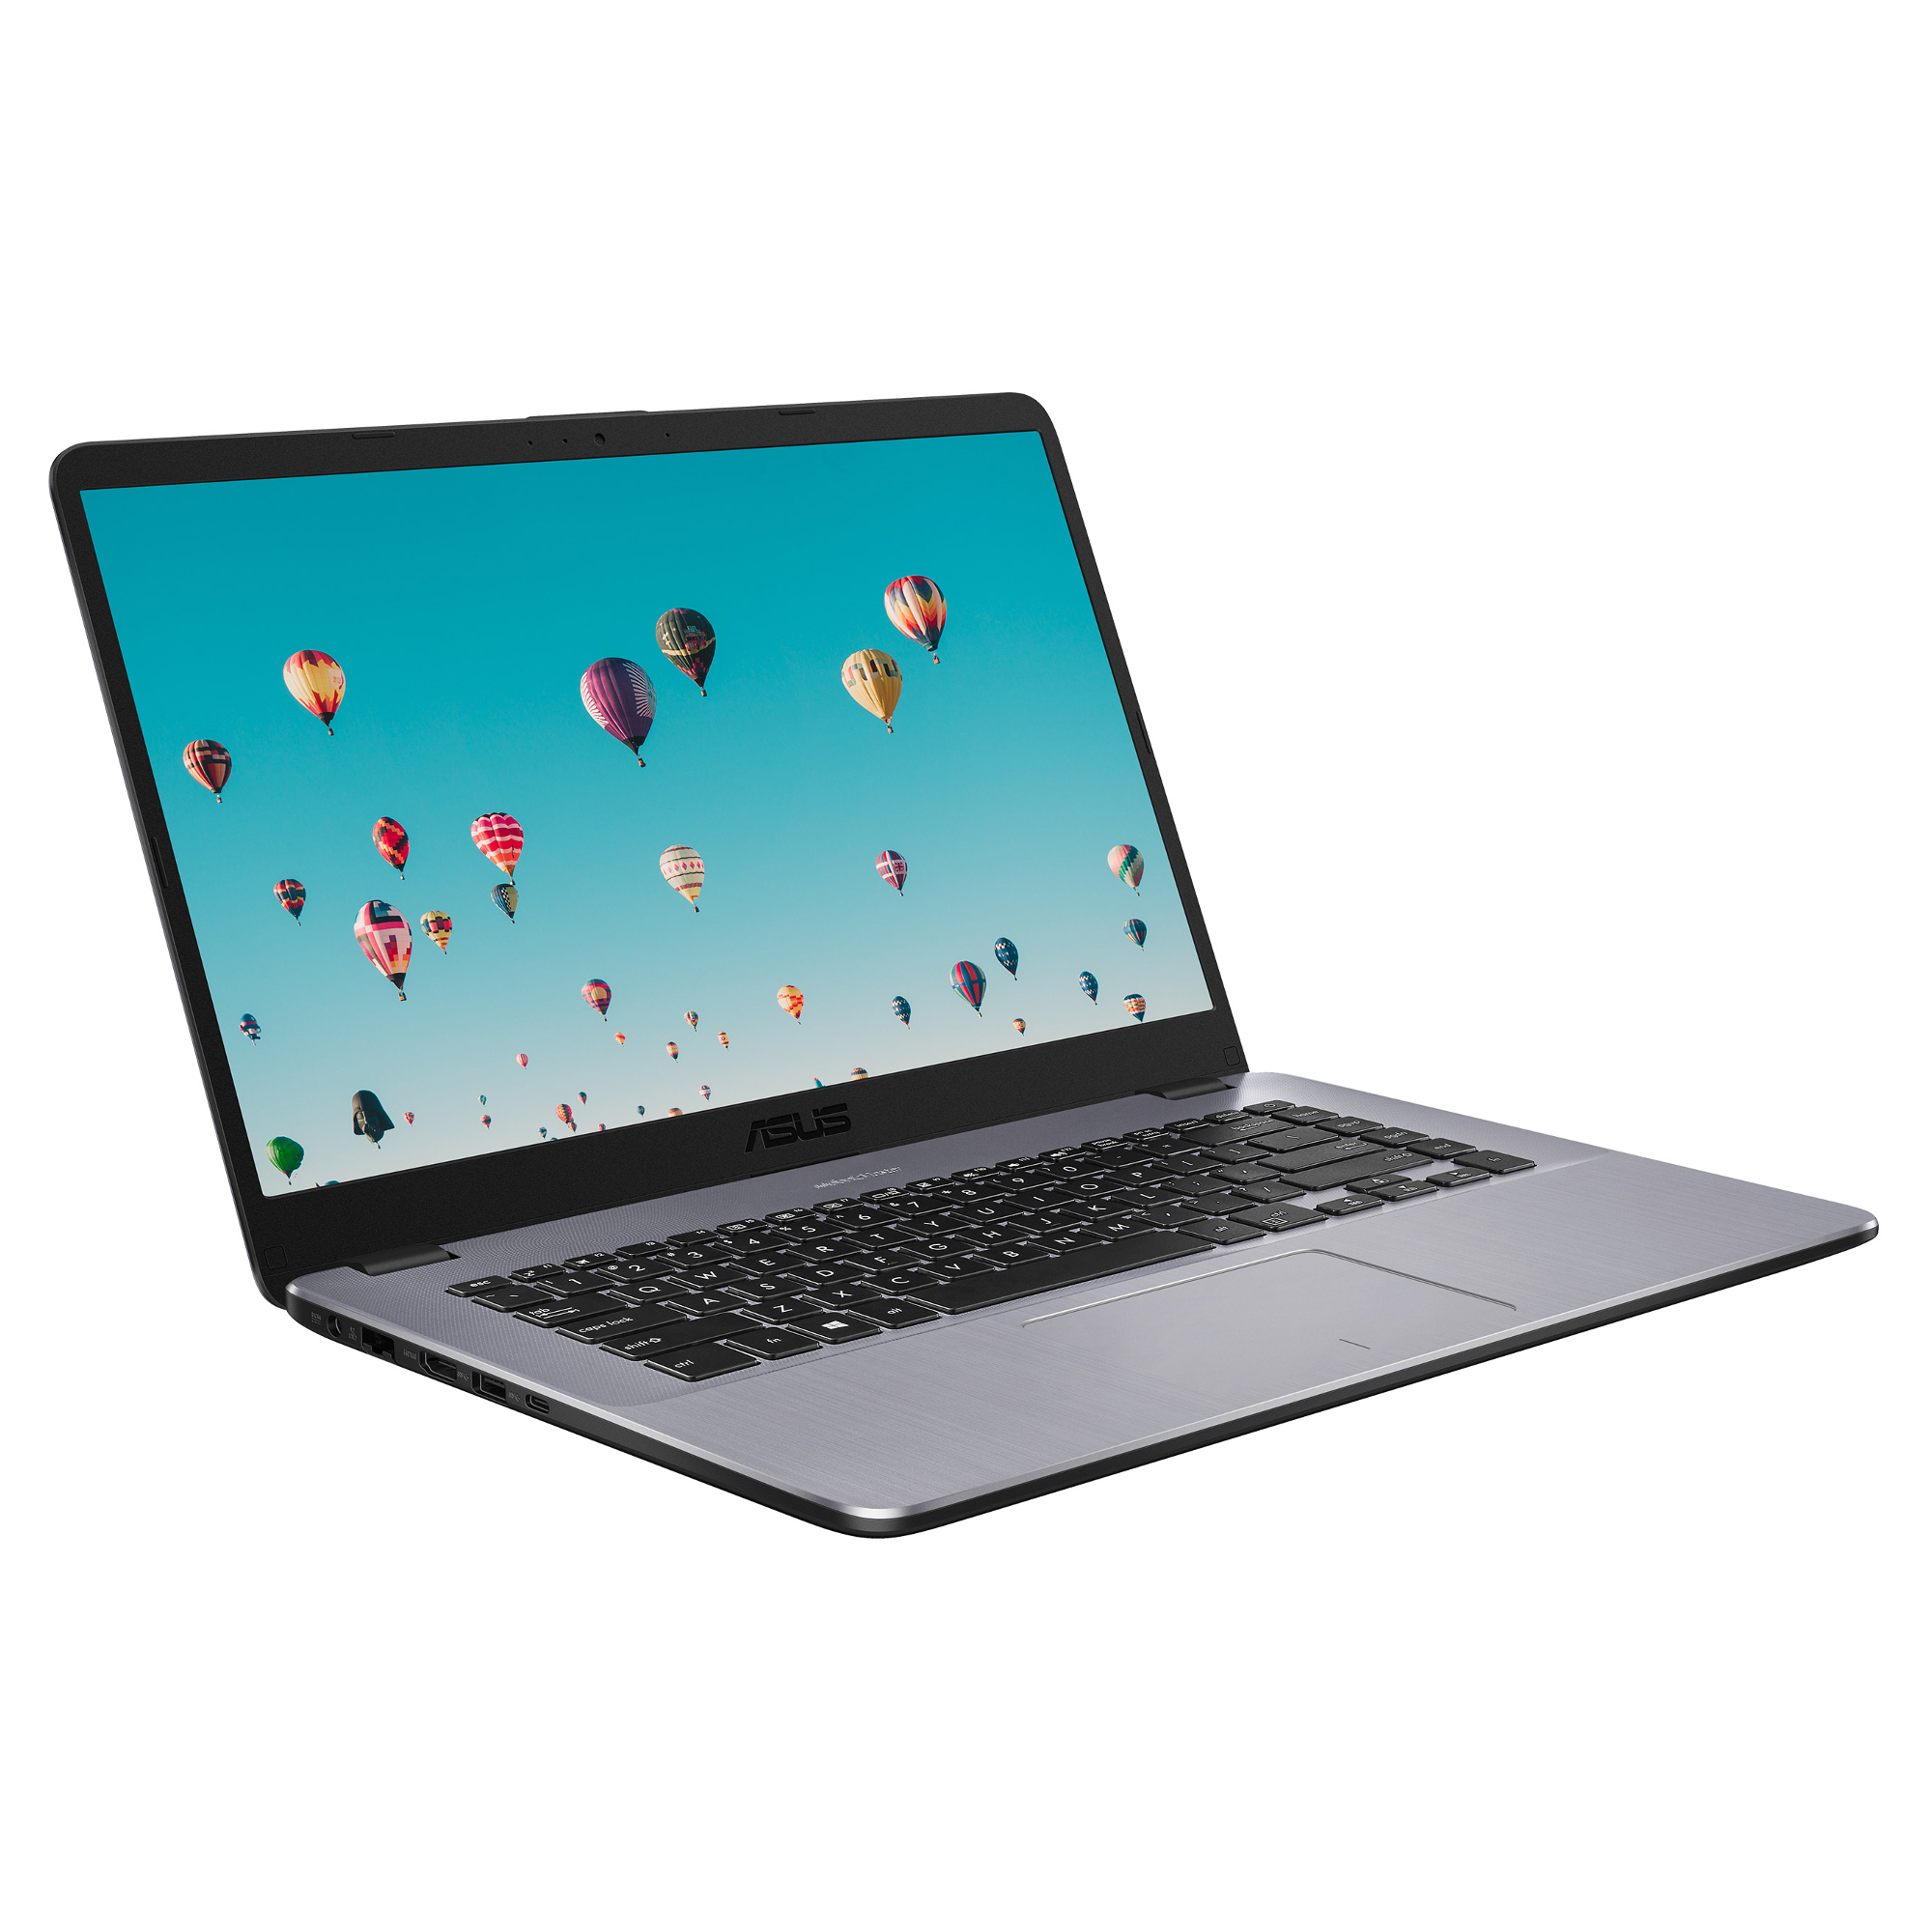 Asus X505za 15 6 Quot Laptop 8gb Memory Amd Ryzen 5 2500u